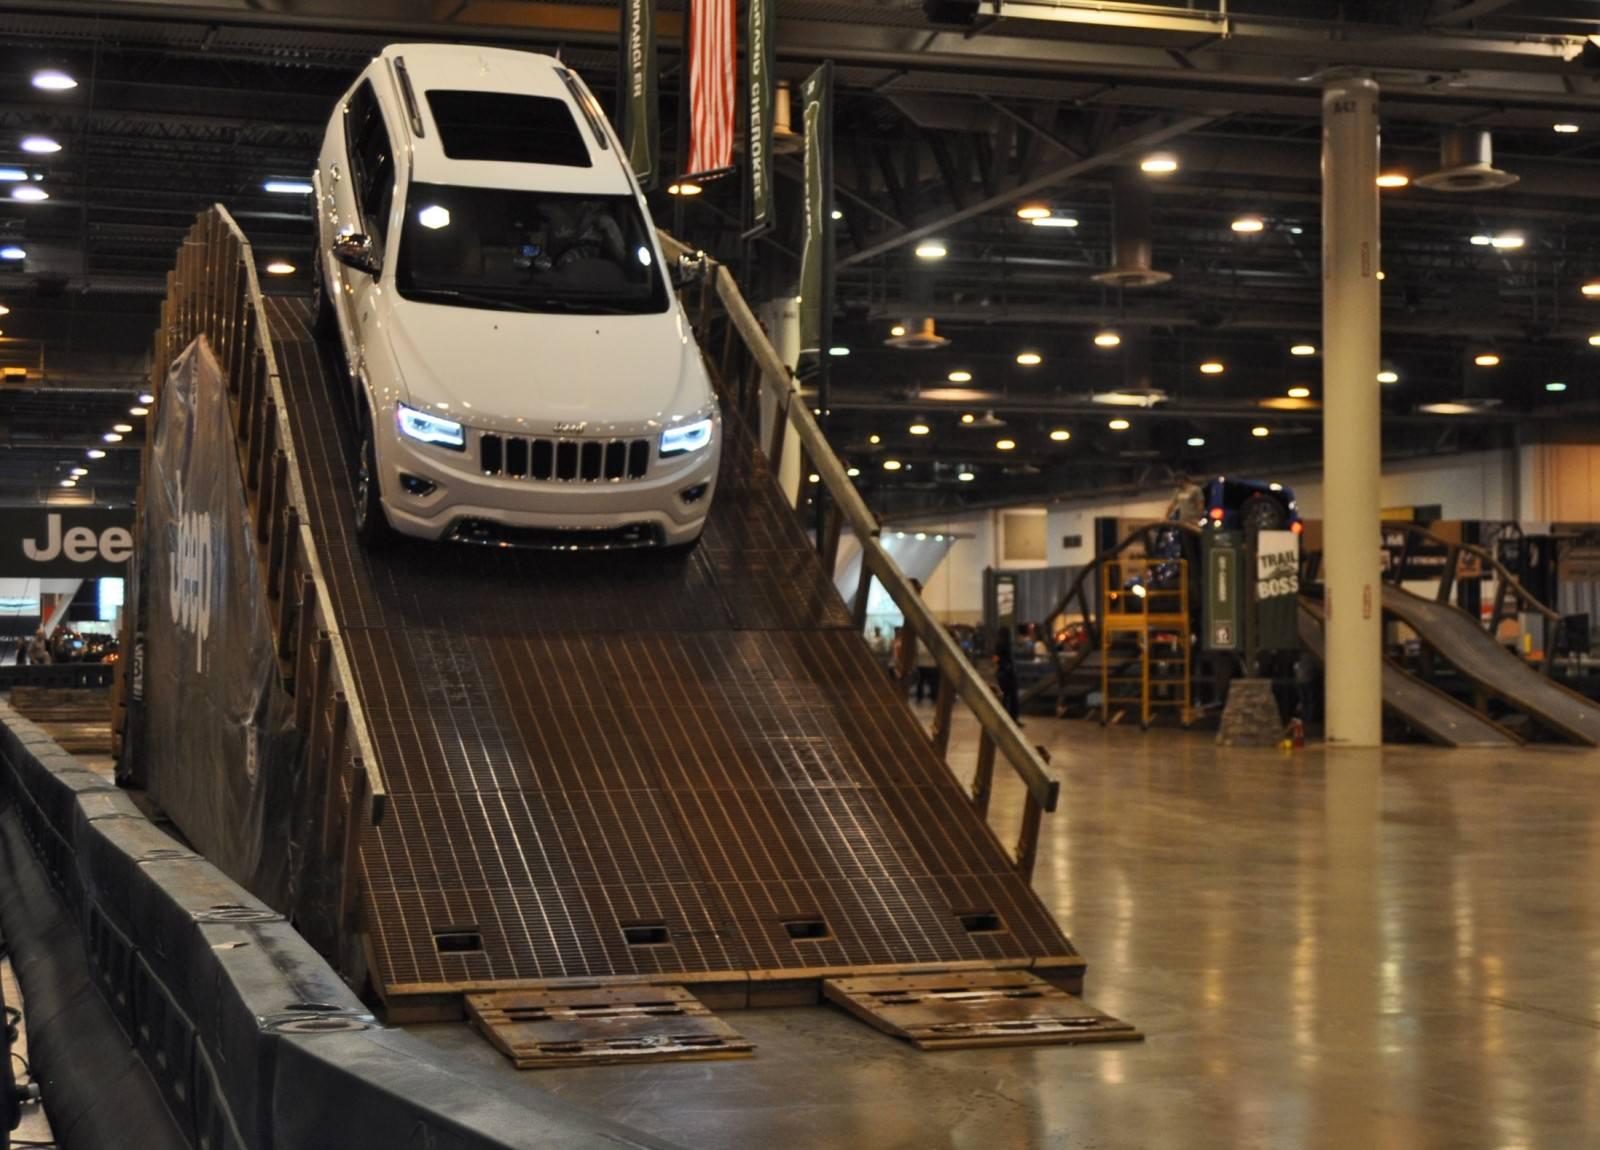 Houston Auto Show - Camp JEEP